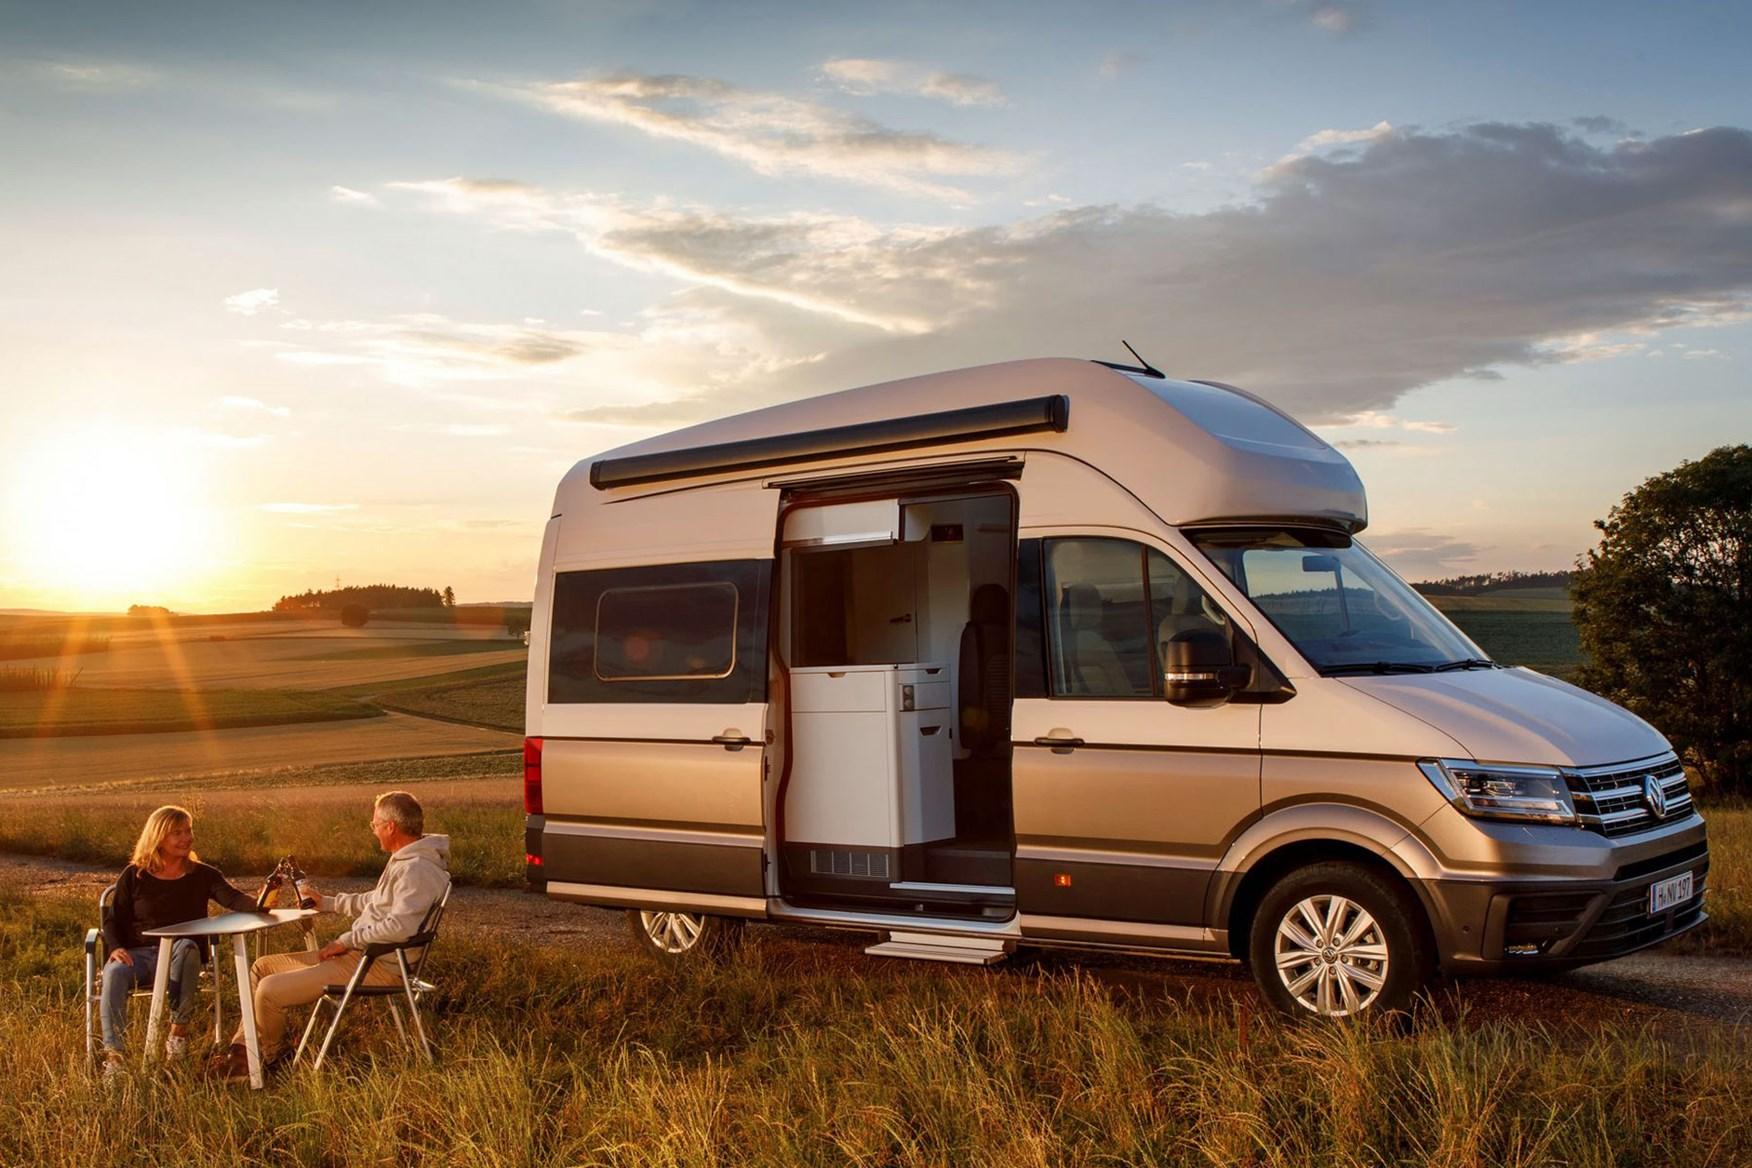 Volkswagen Grand California Campervan Based On Vw Crafter